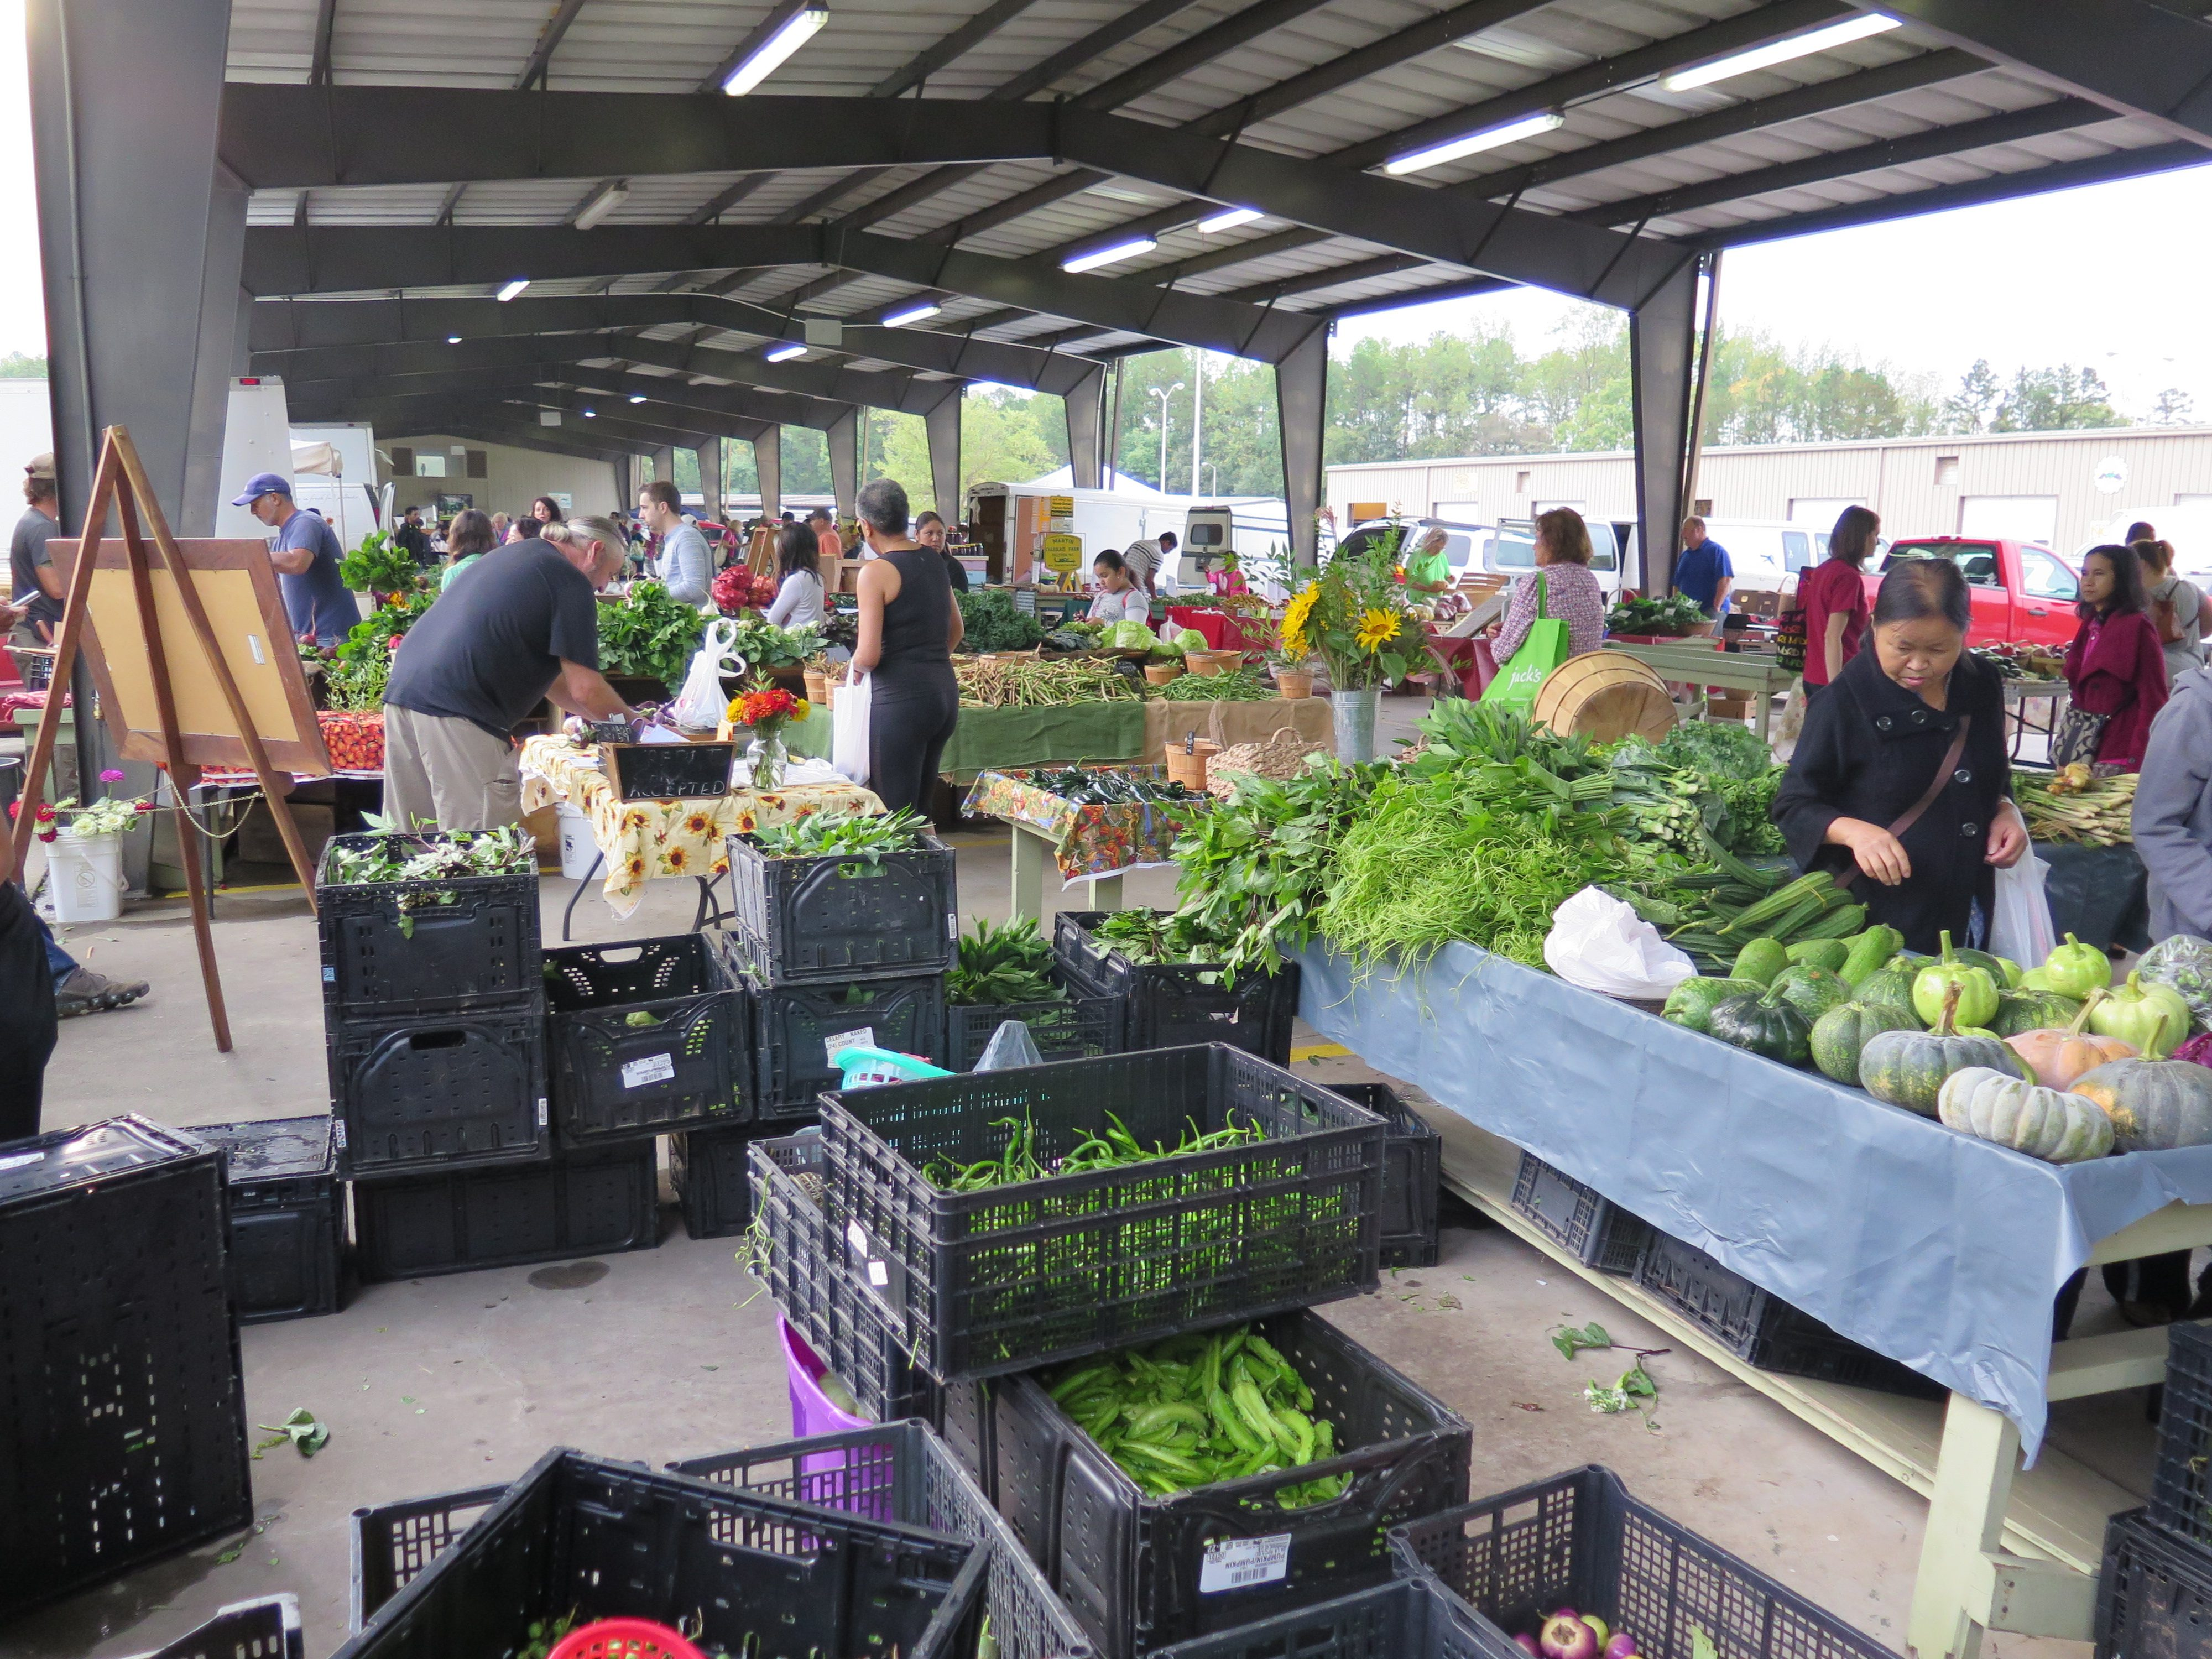 Charlotte Regional Market